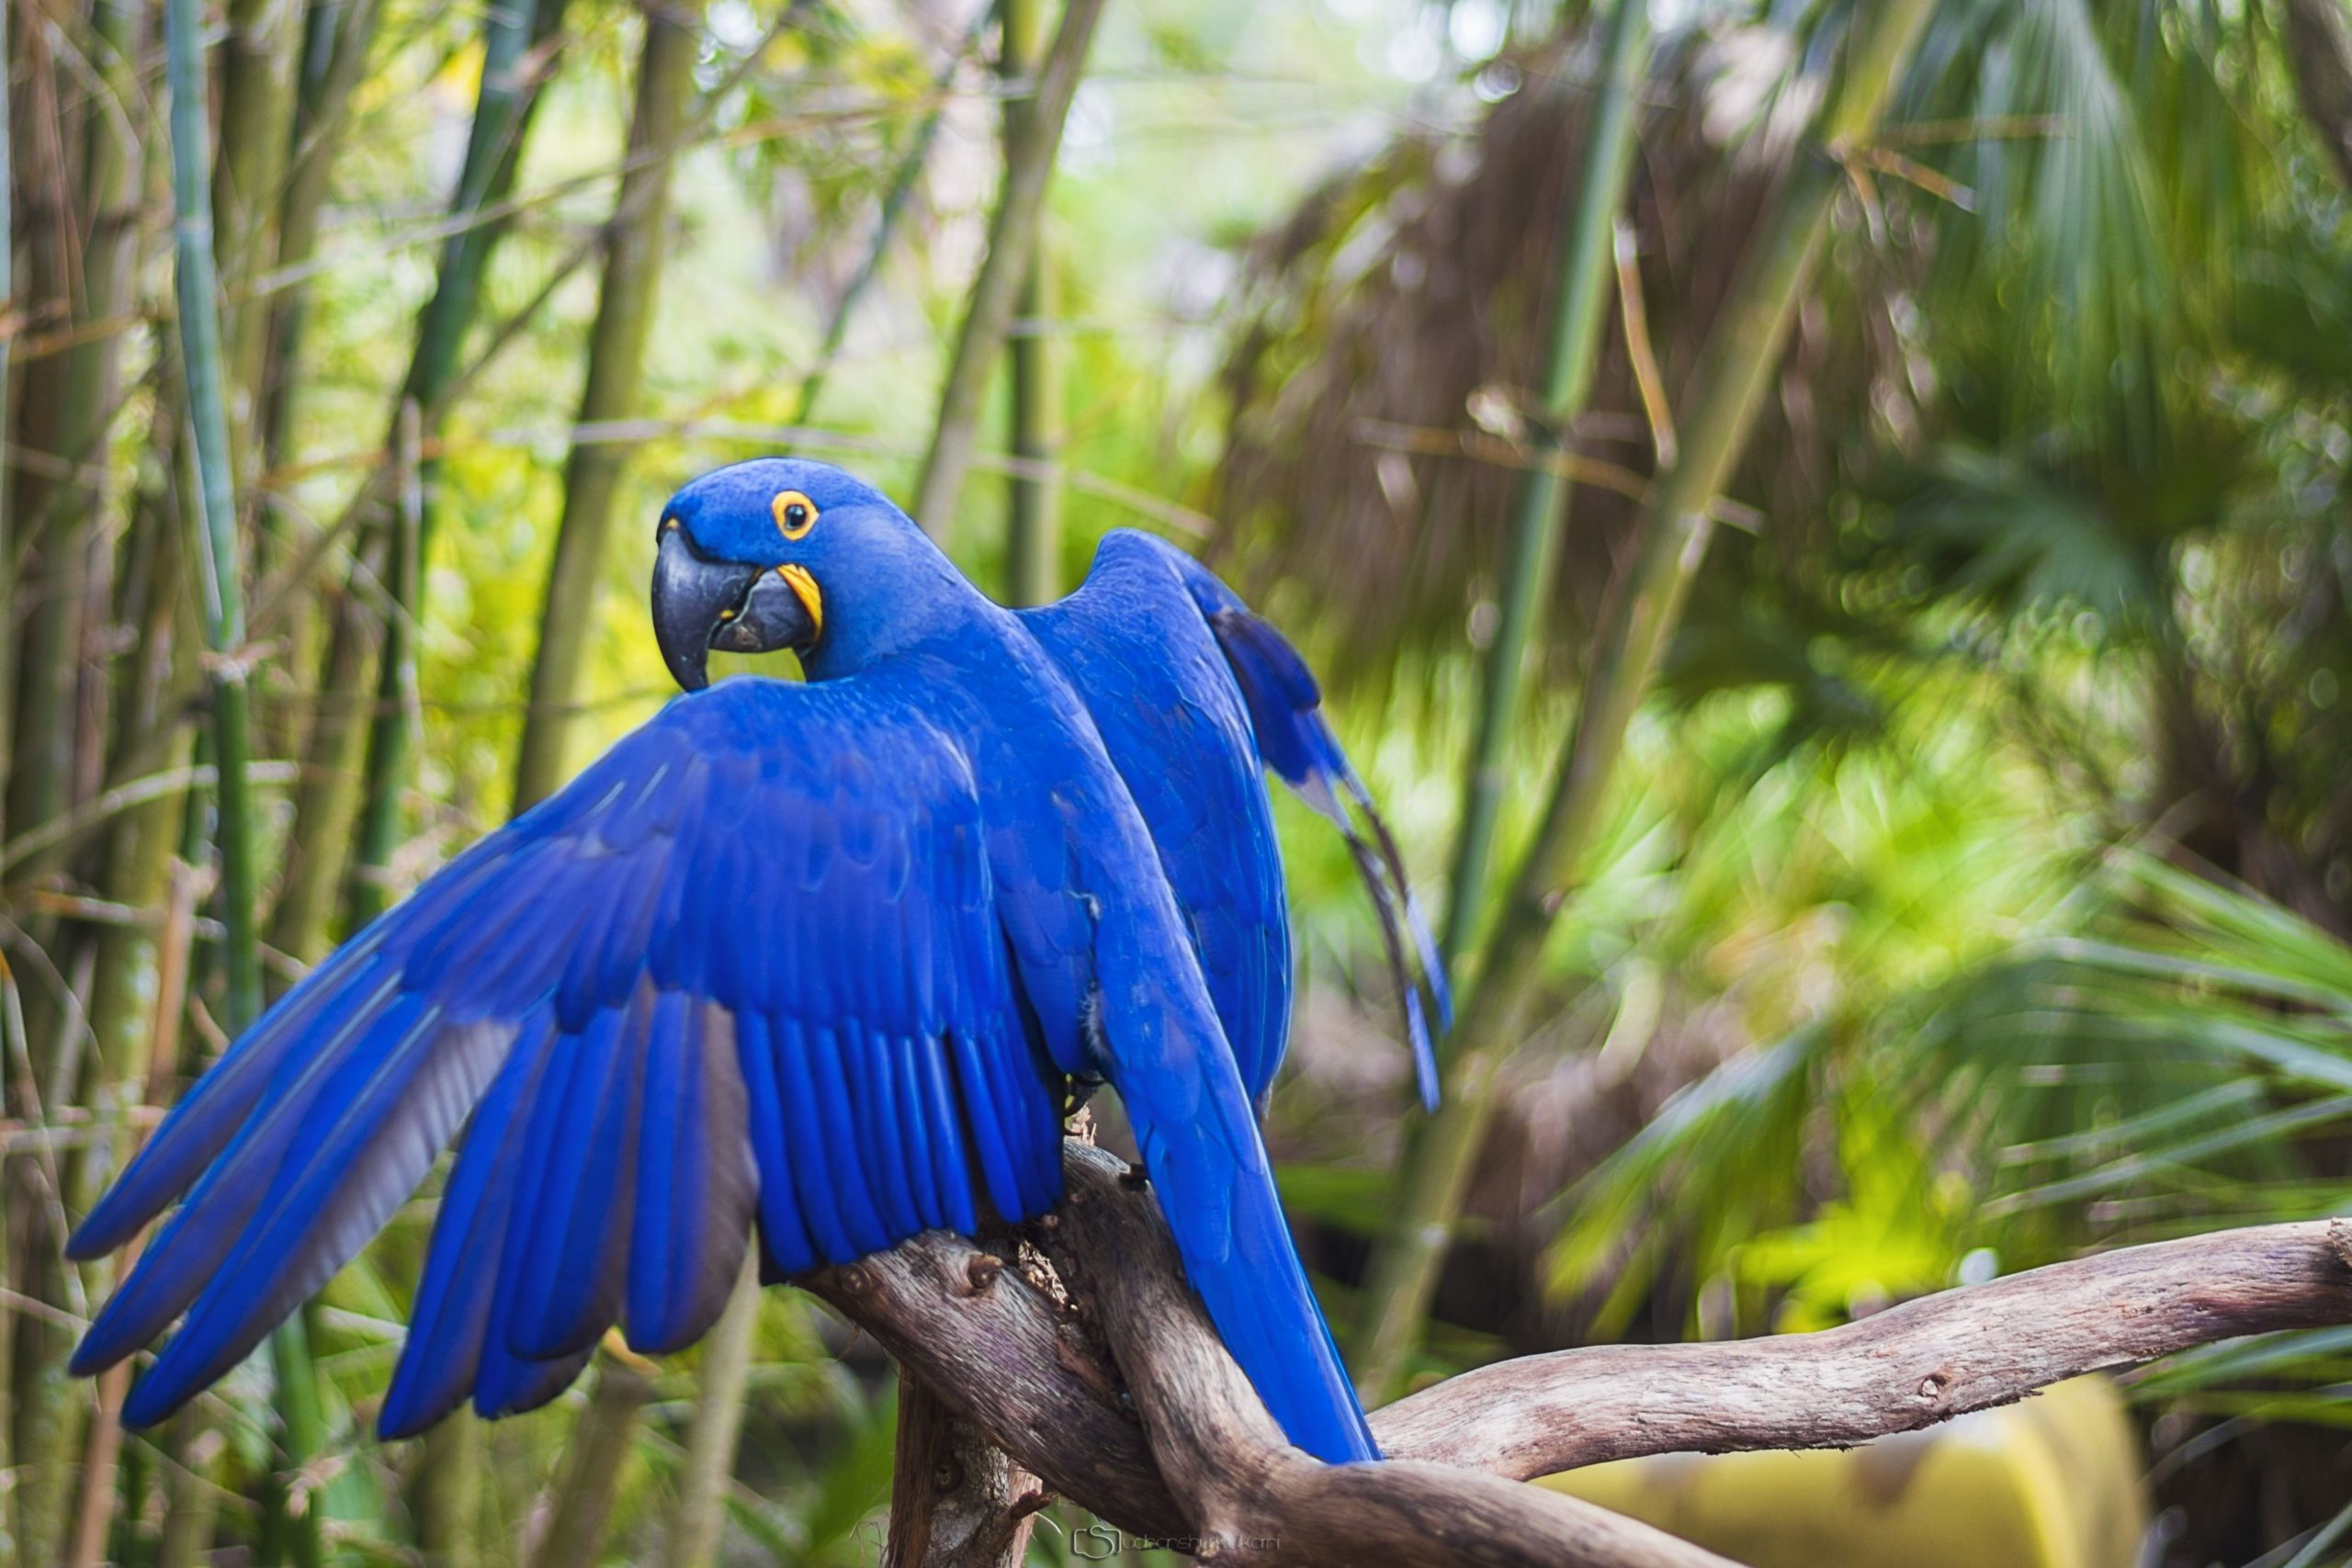 hd photos of parrots